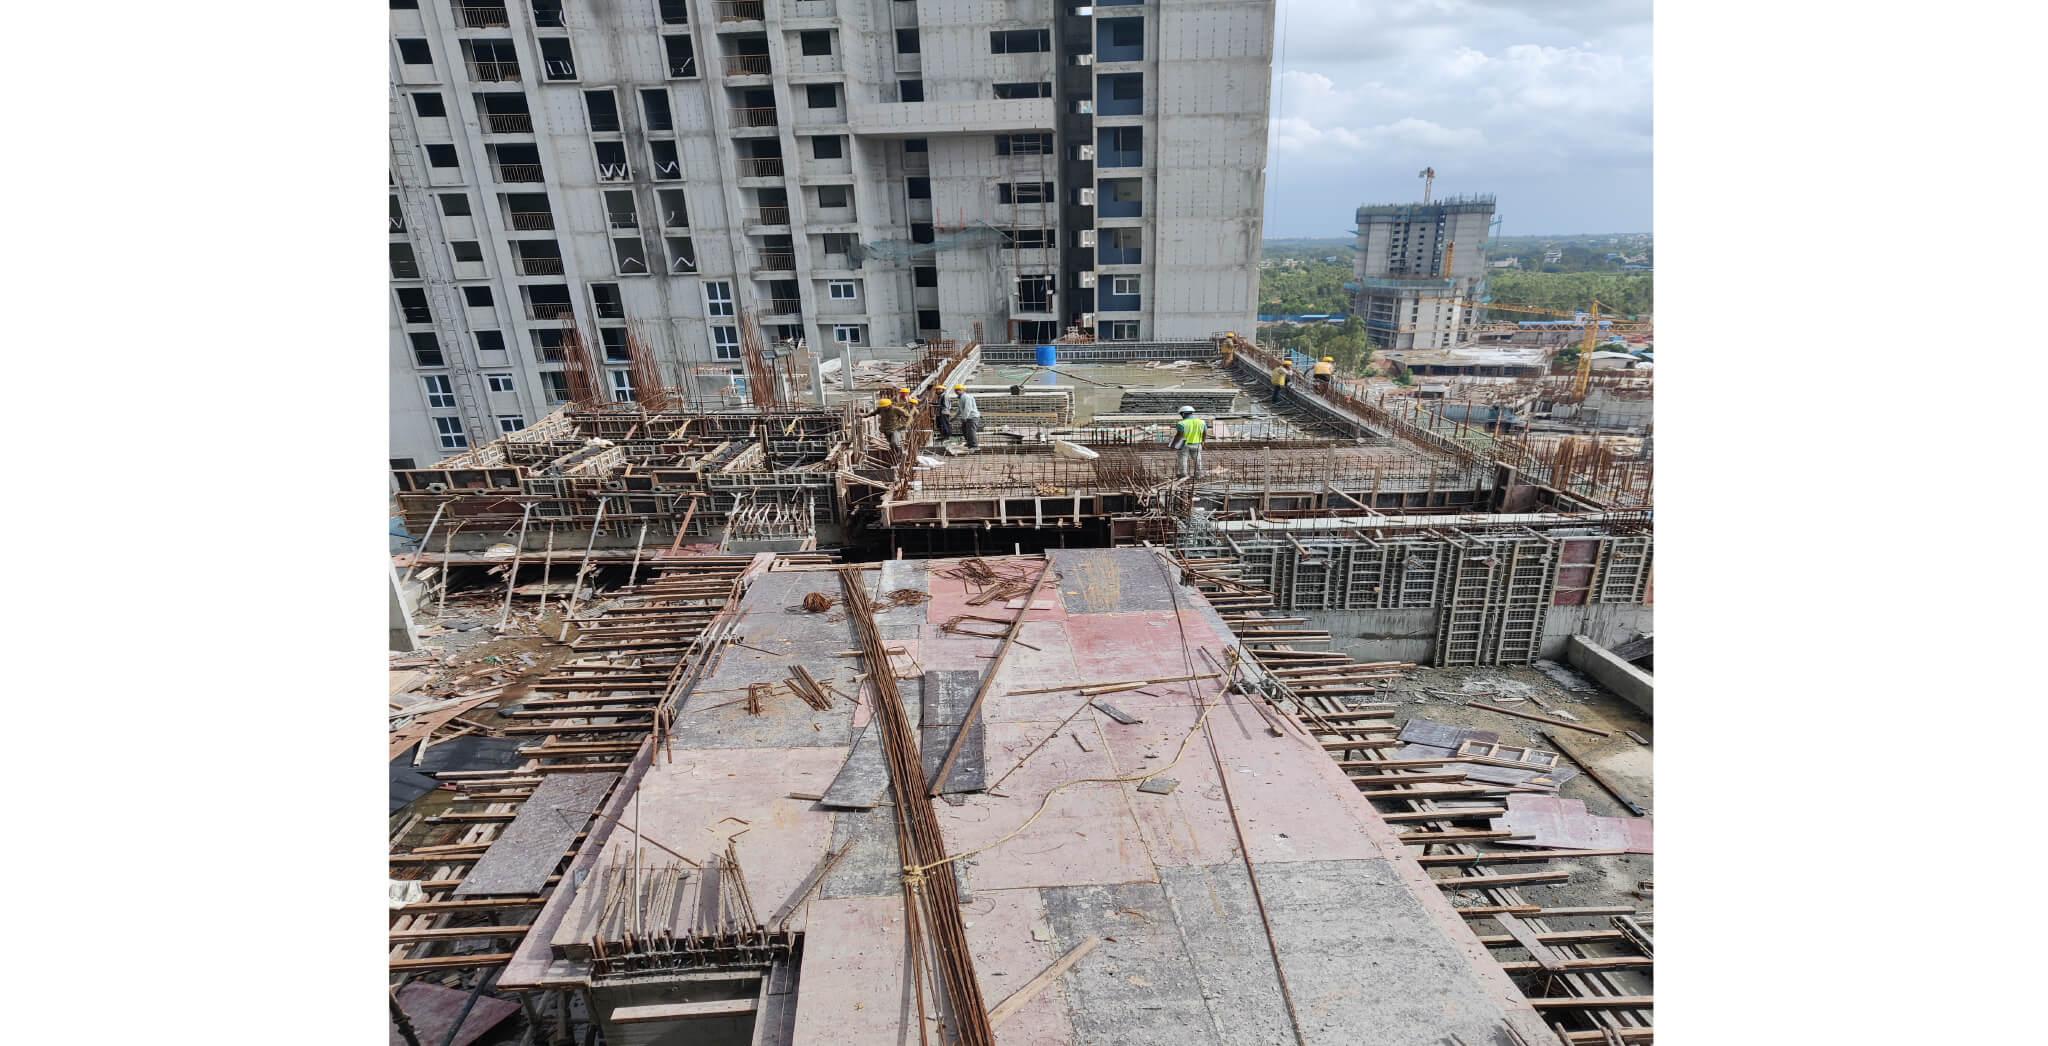 Aug 2021 - Eden Tower D: Swimming pool work in progress